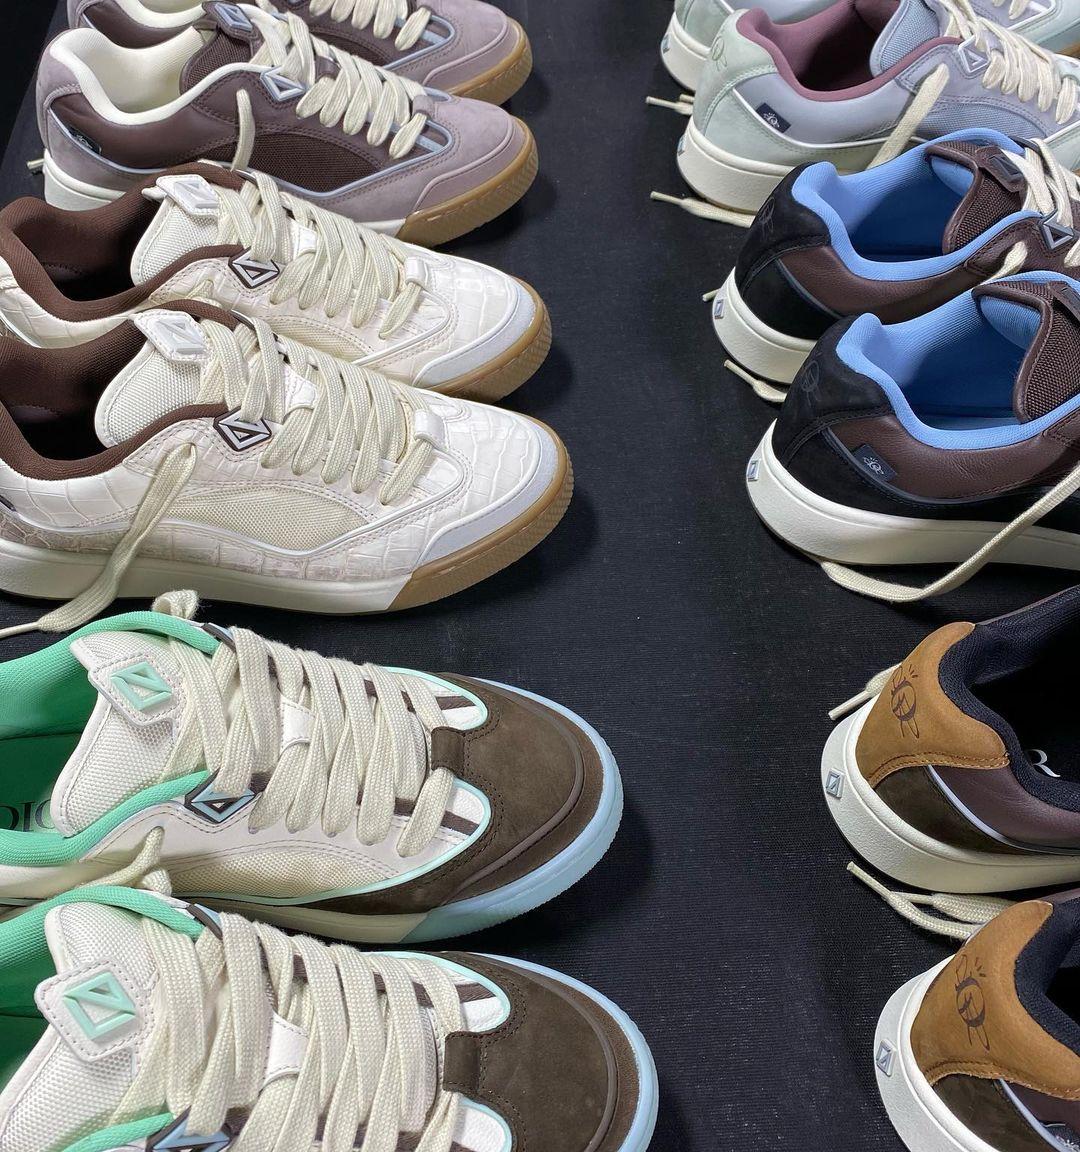 Dior,Cactus Jack,Travis Scott  Travis Scott x Dior 新鞋实物曝光!你觉得能火吗?